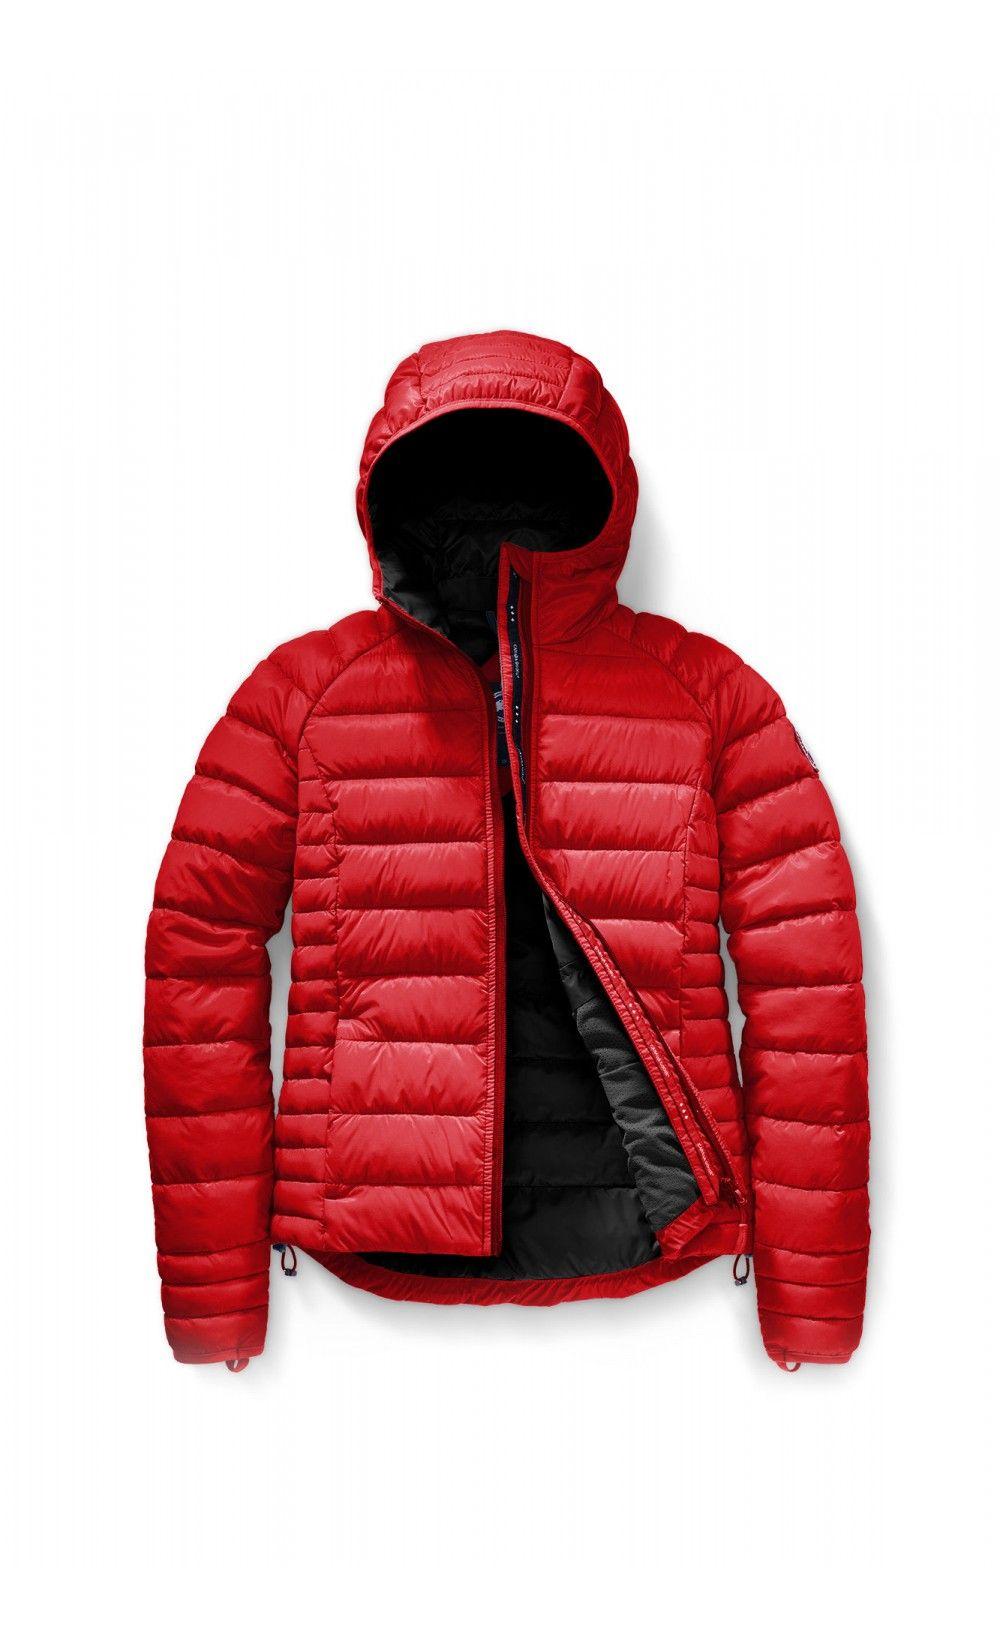 Canada Goose Brookvale Hoody Red Women Canada Goose Blackfriday Fashion Parka Jacket Canadagoose Thankgivingda Canada Goose Brookvale Hoodies Down Coat